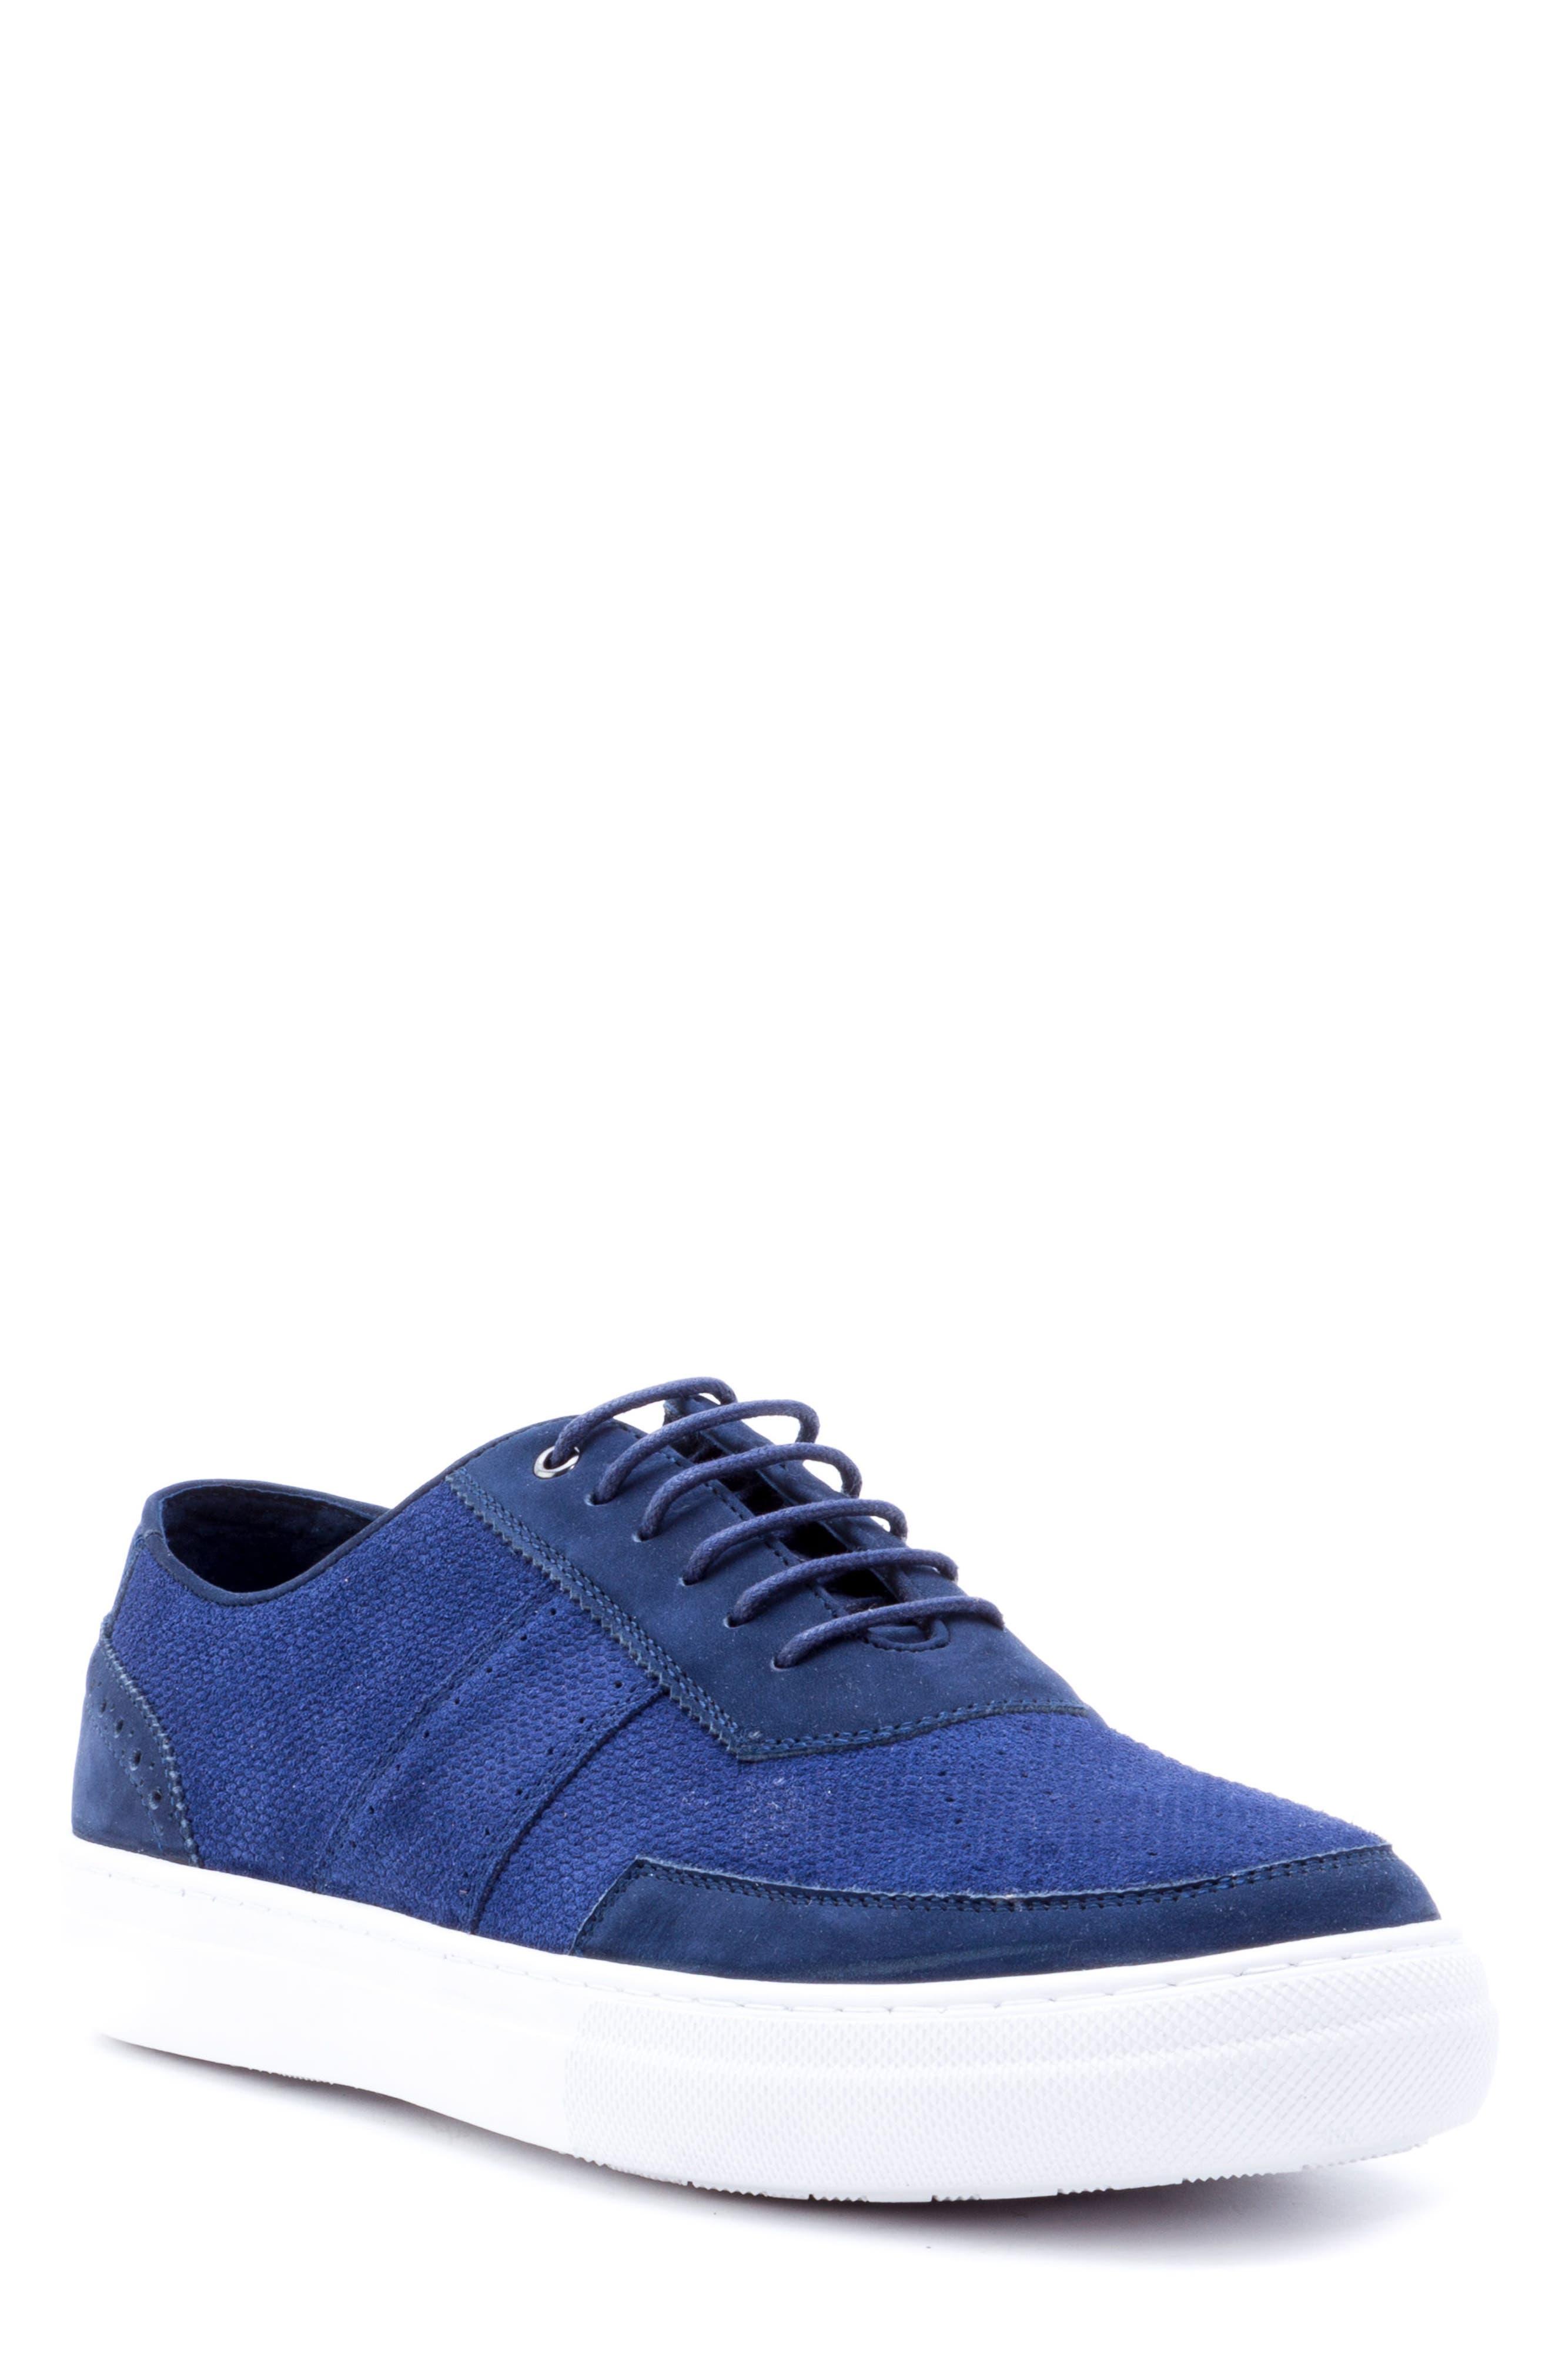 Zanzara House Low Top Sneaker, Blue